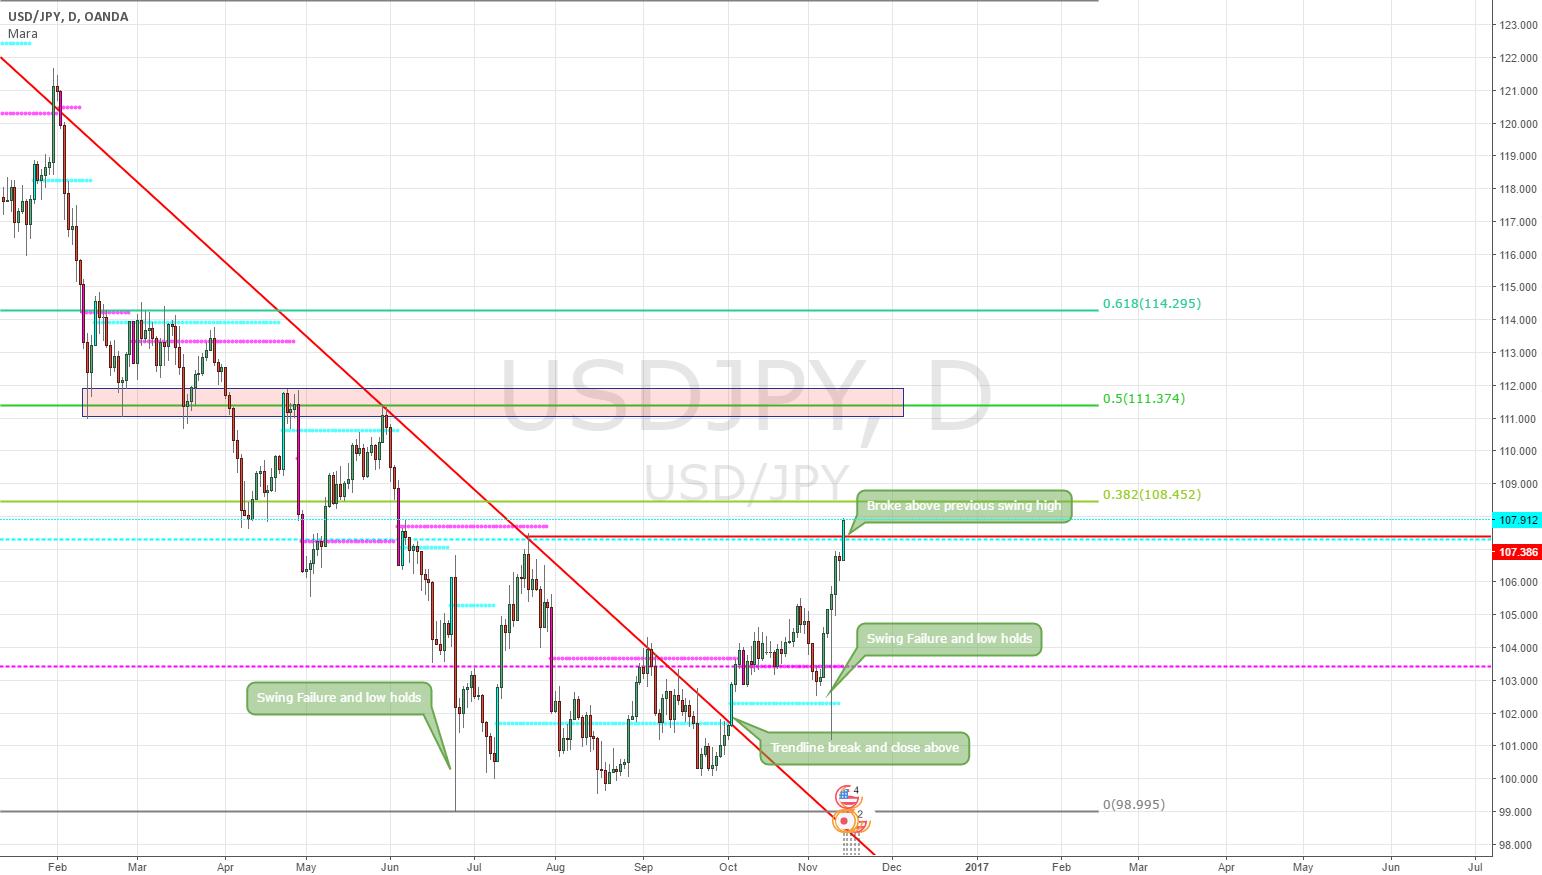 Bullish USD/JPY PA